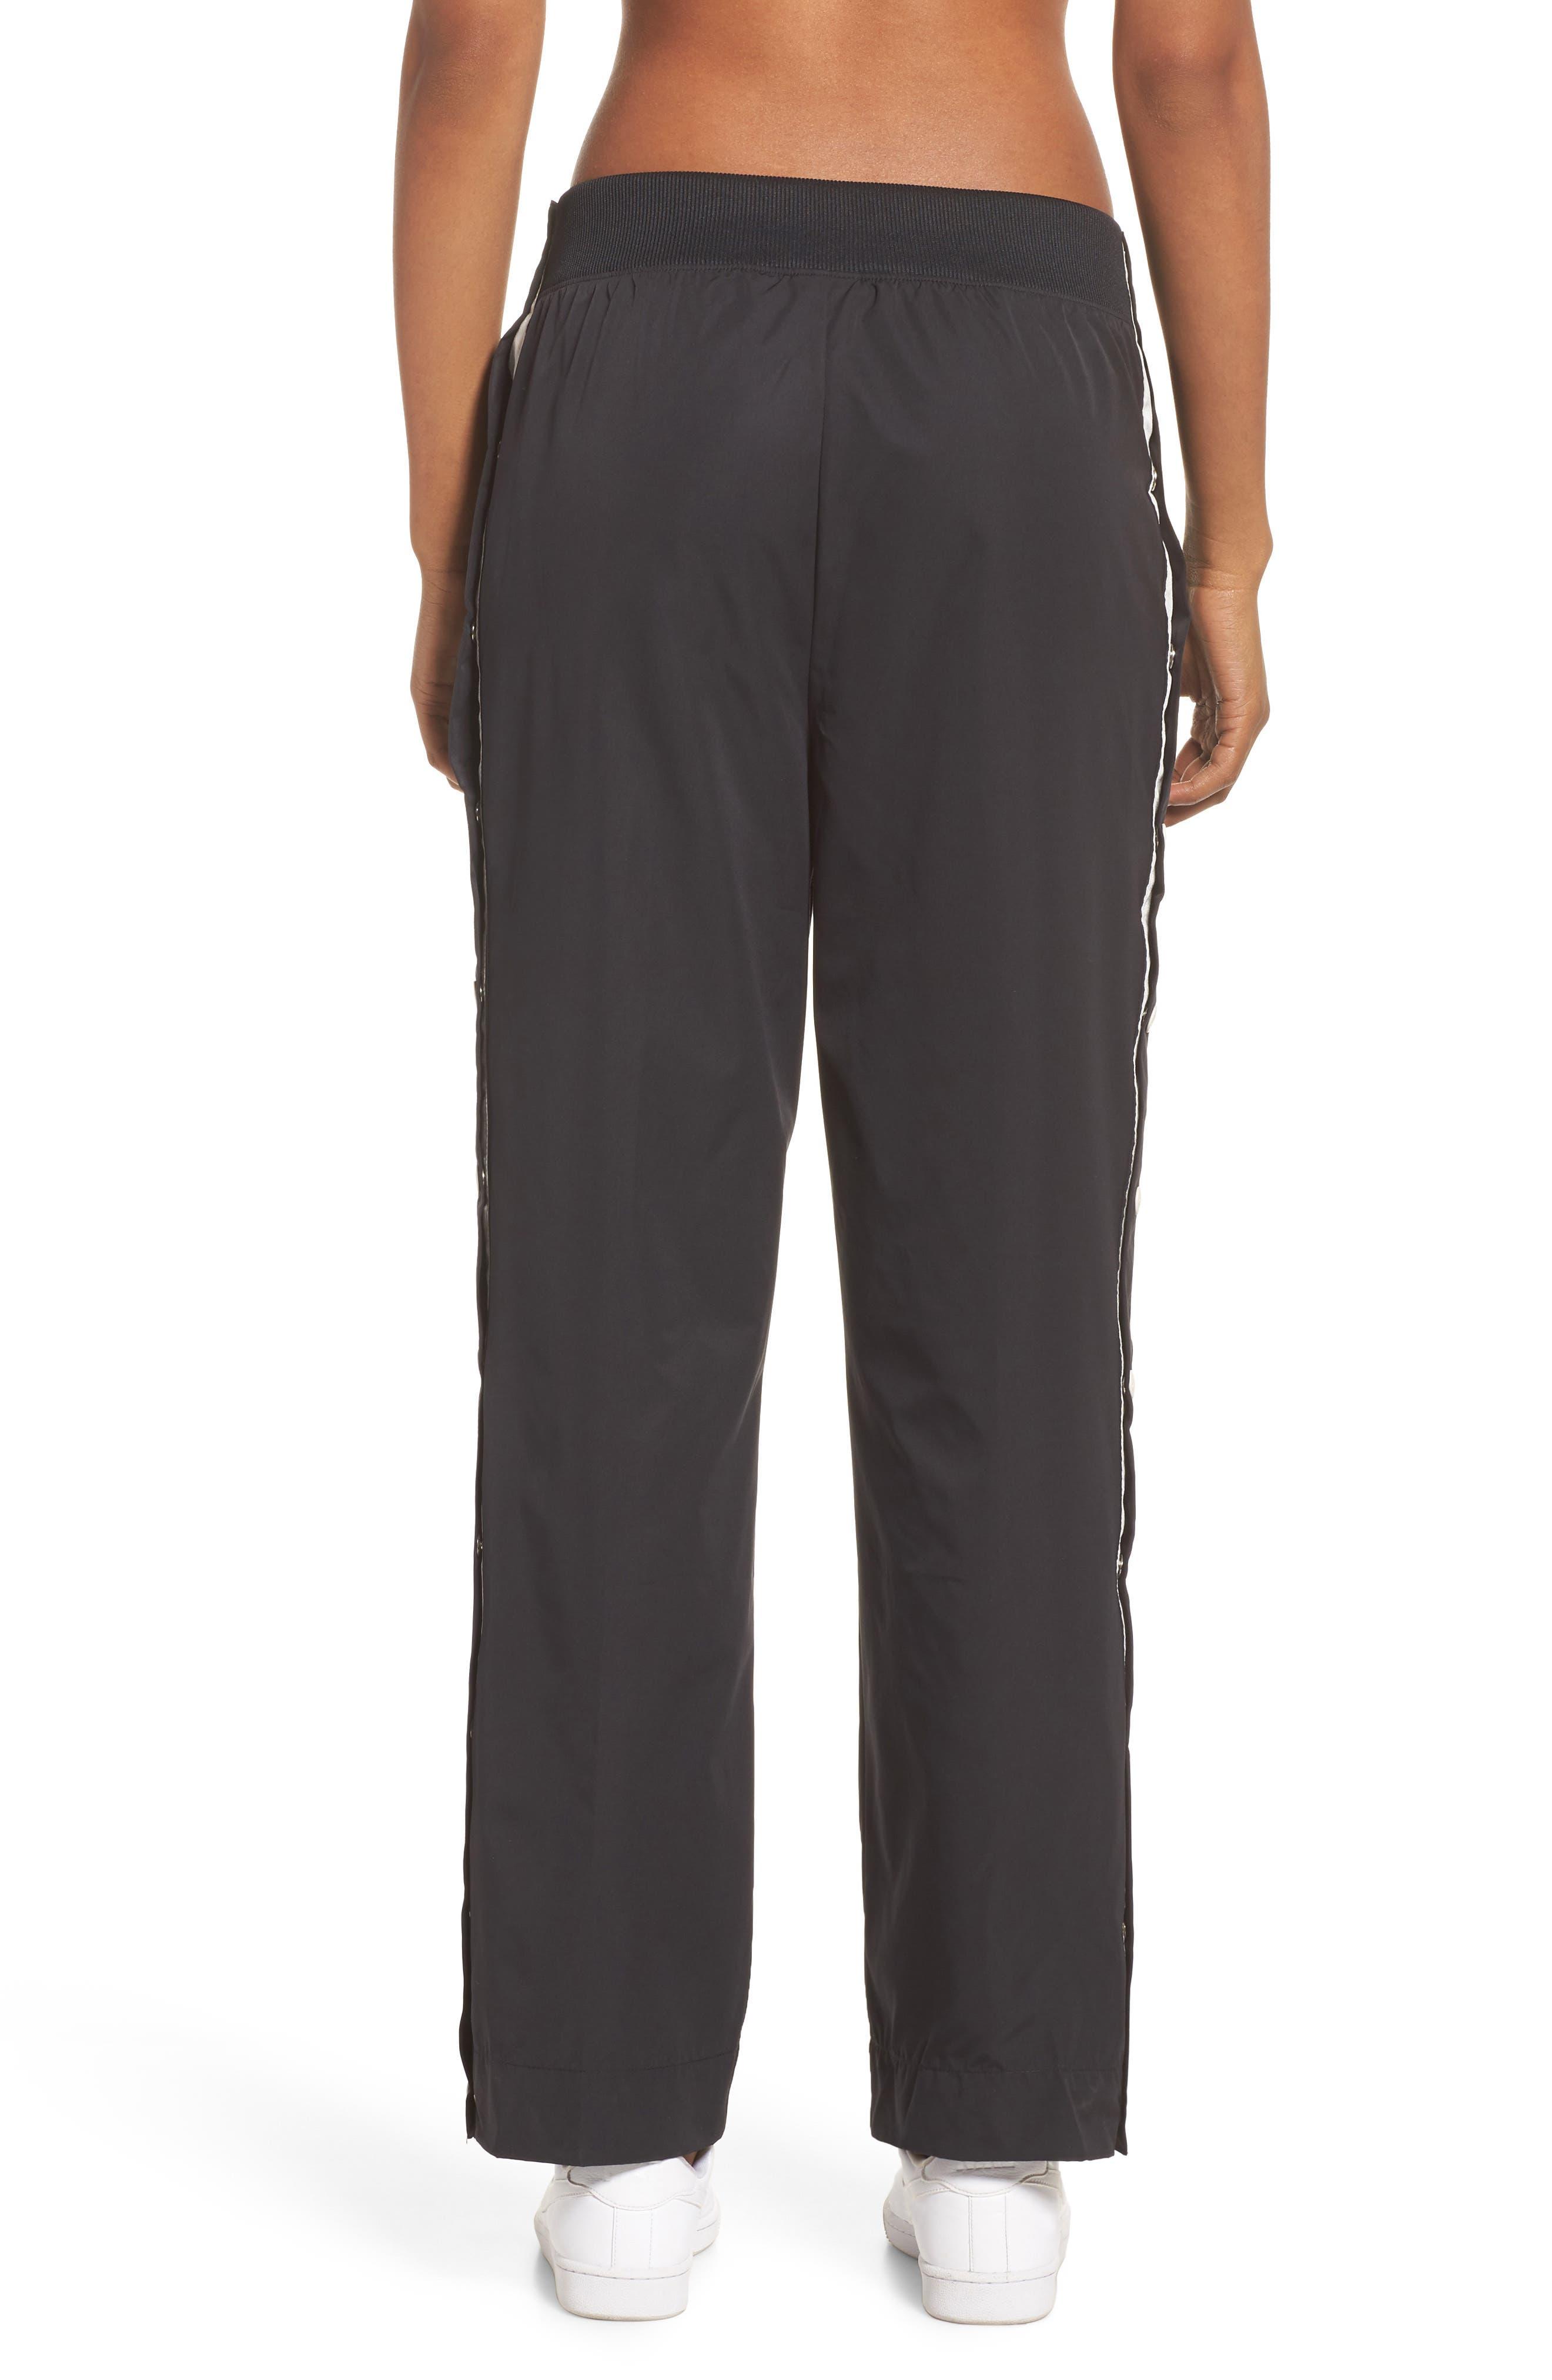 Sportswear Archive Snap Track Pants,                             Alternate thumbnail 2, color,                             Black/ Sail